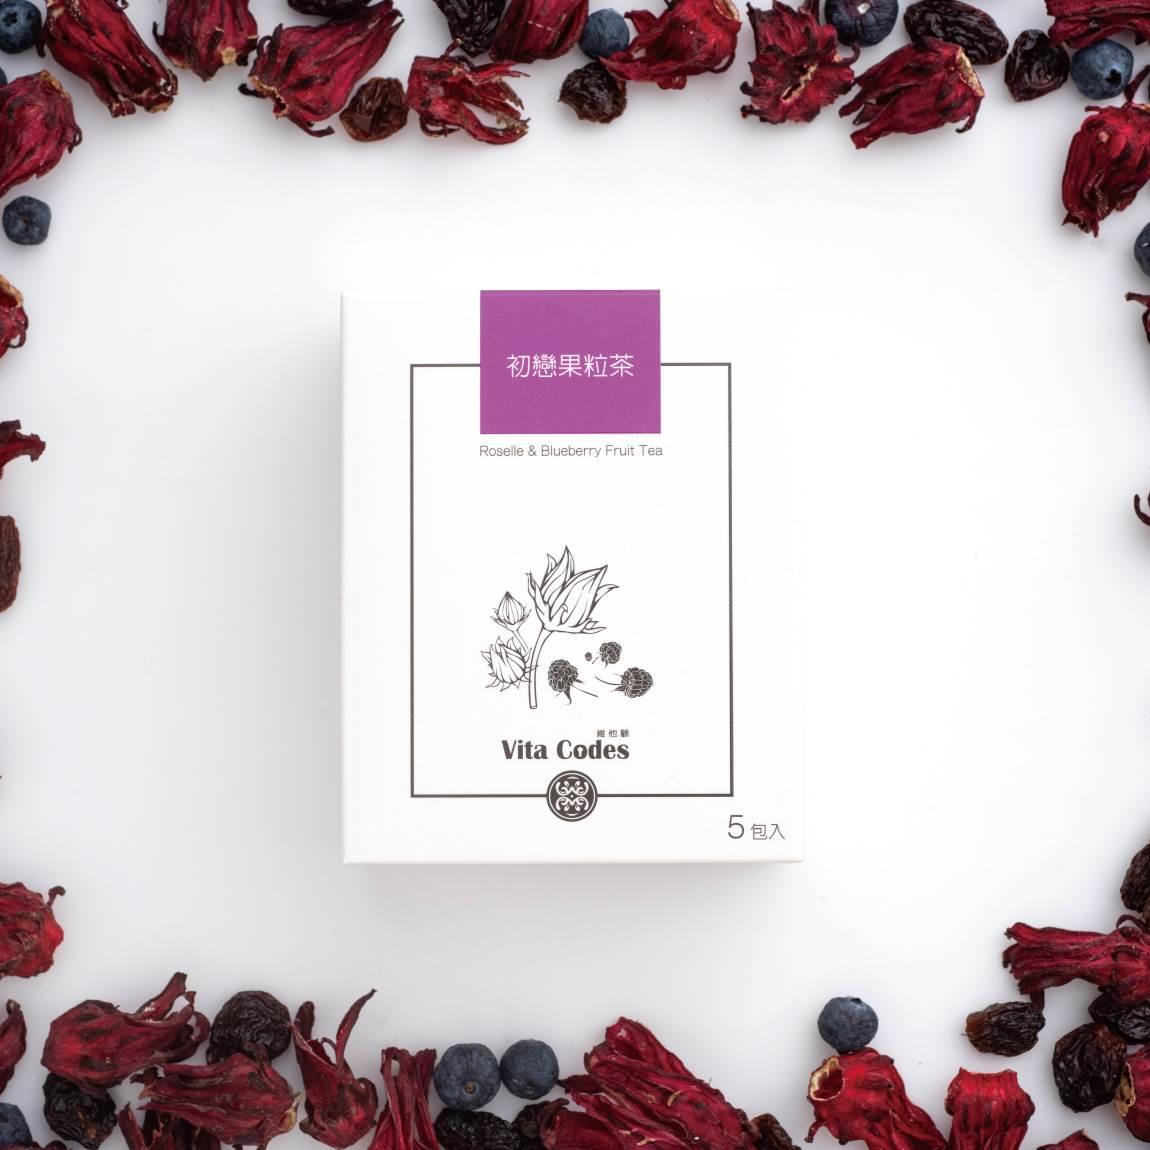 VitaCodes美顏茶-產品介紹04-1-初戀果粒茶